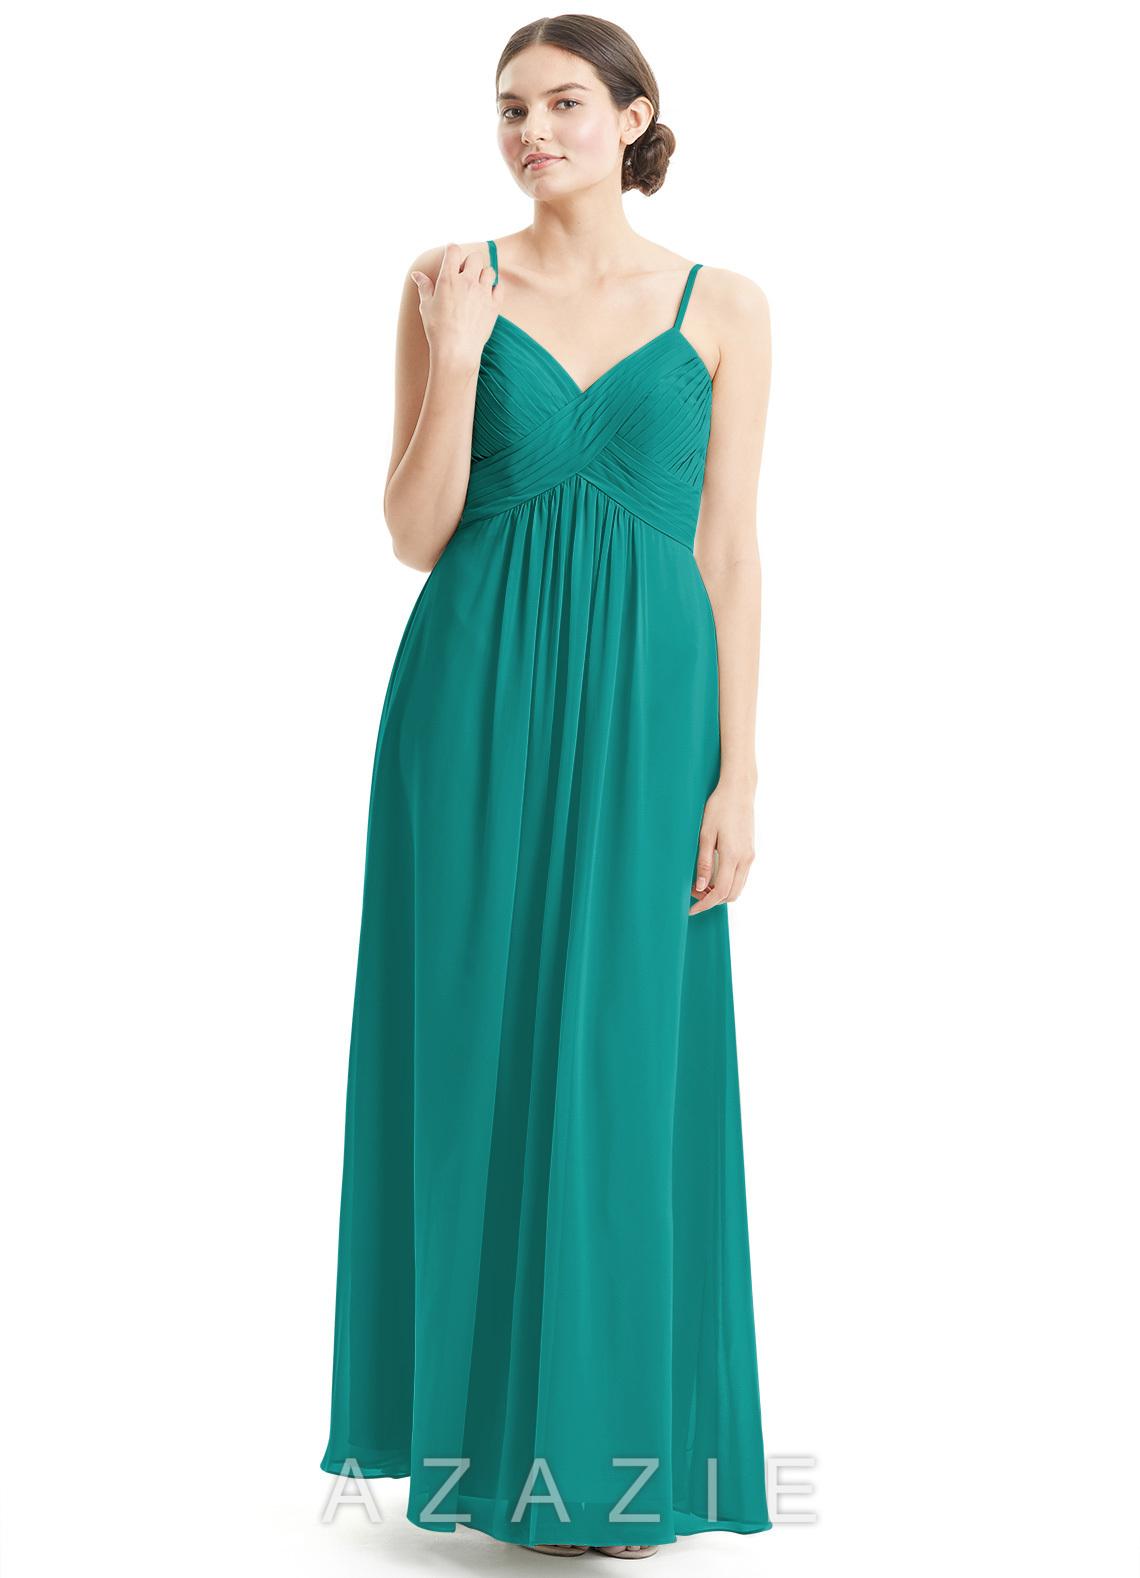 31852f407e6 Azazie Shannon Bridesmaid Dresses